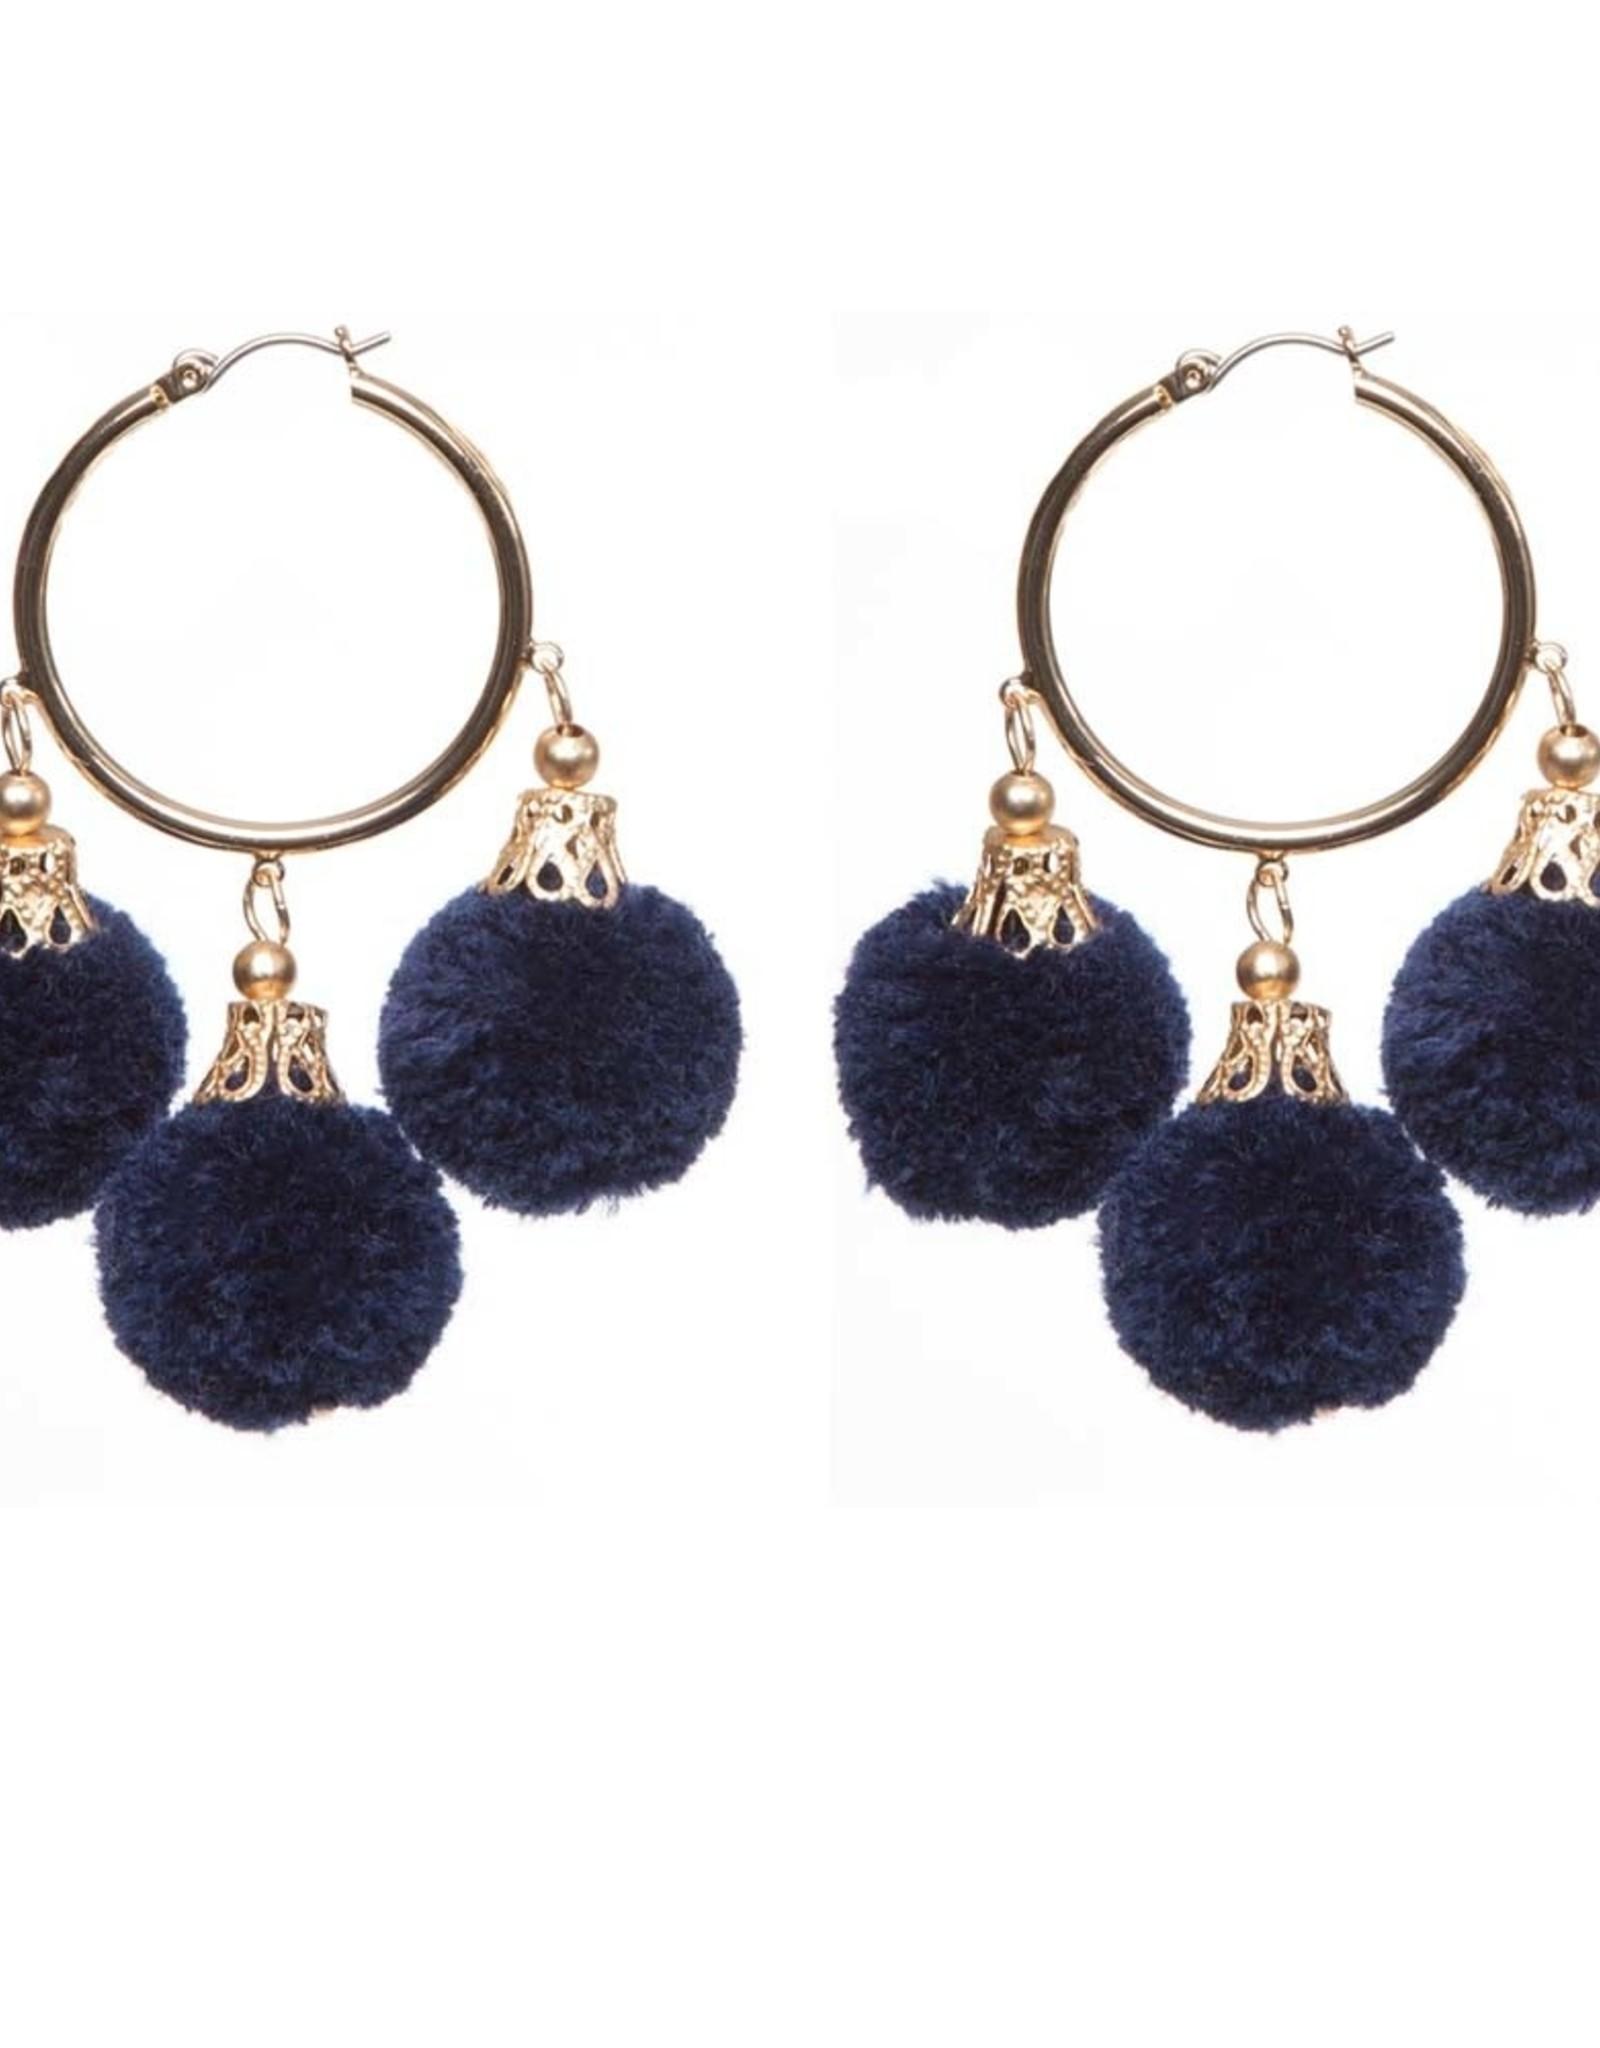 Fornash Fiesta Pom Pom Earrings